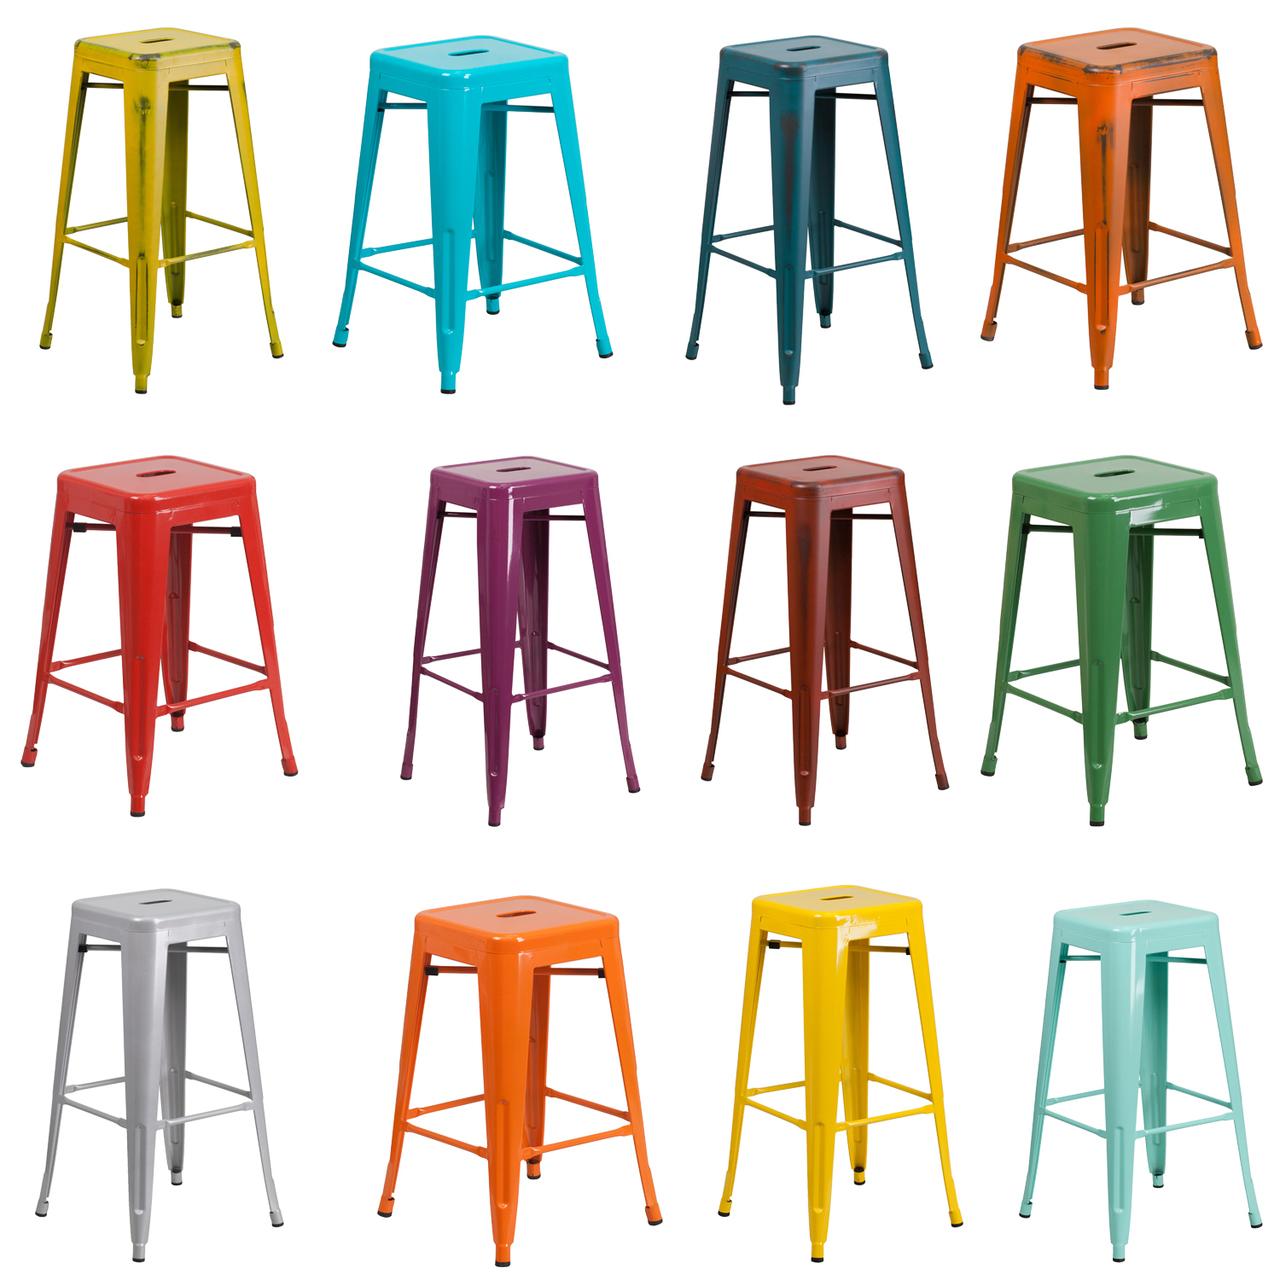 Awe Inspiring Indoor Outdoor Metal Backless Stool Creativecarmelina Interior Chair Design Creativecarmelinacom